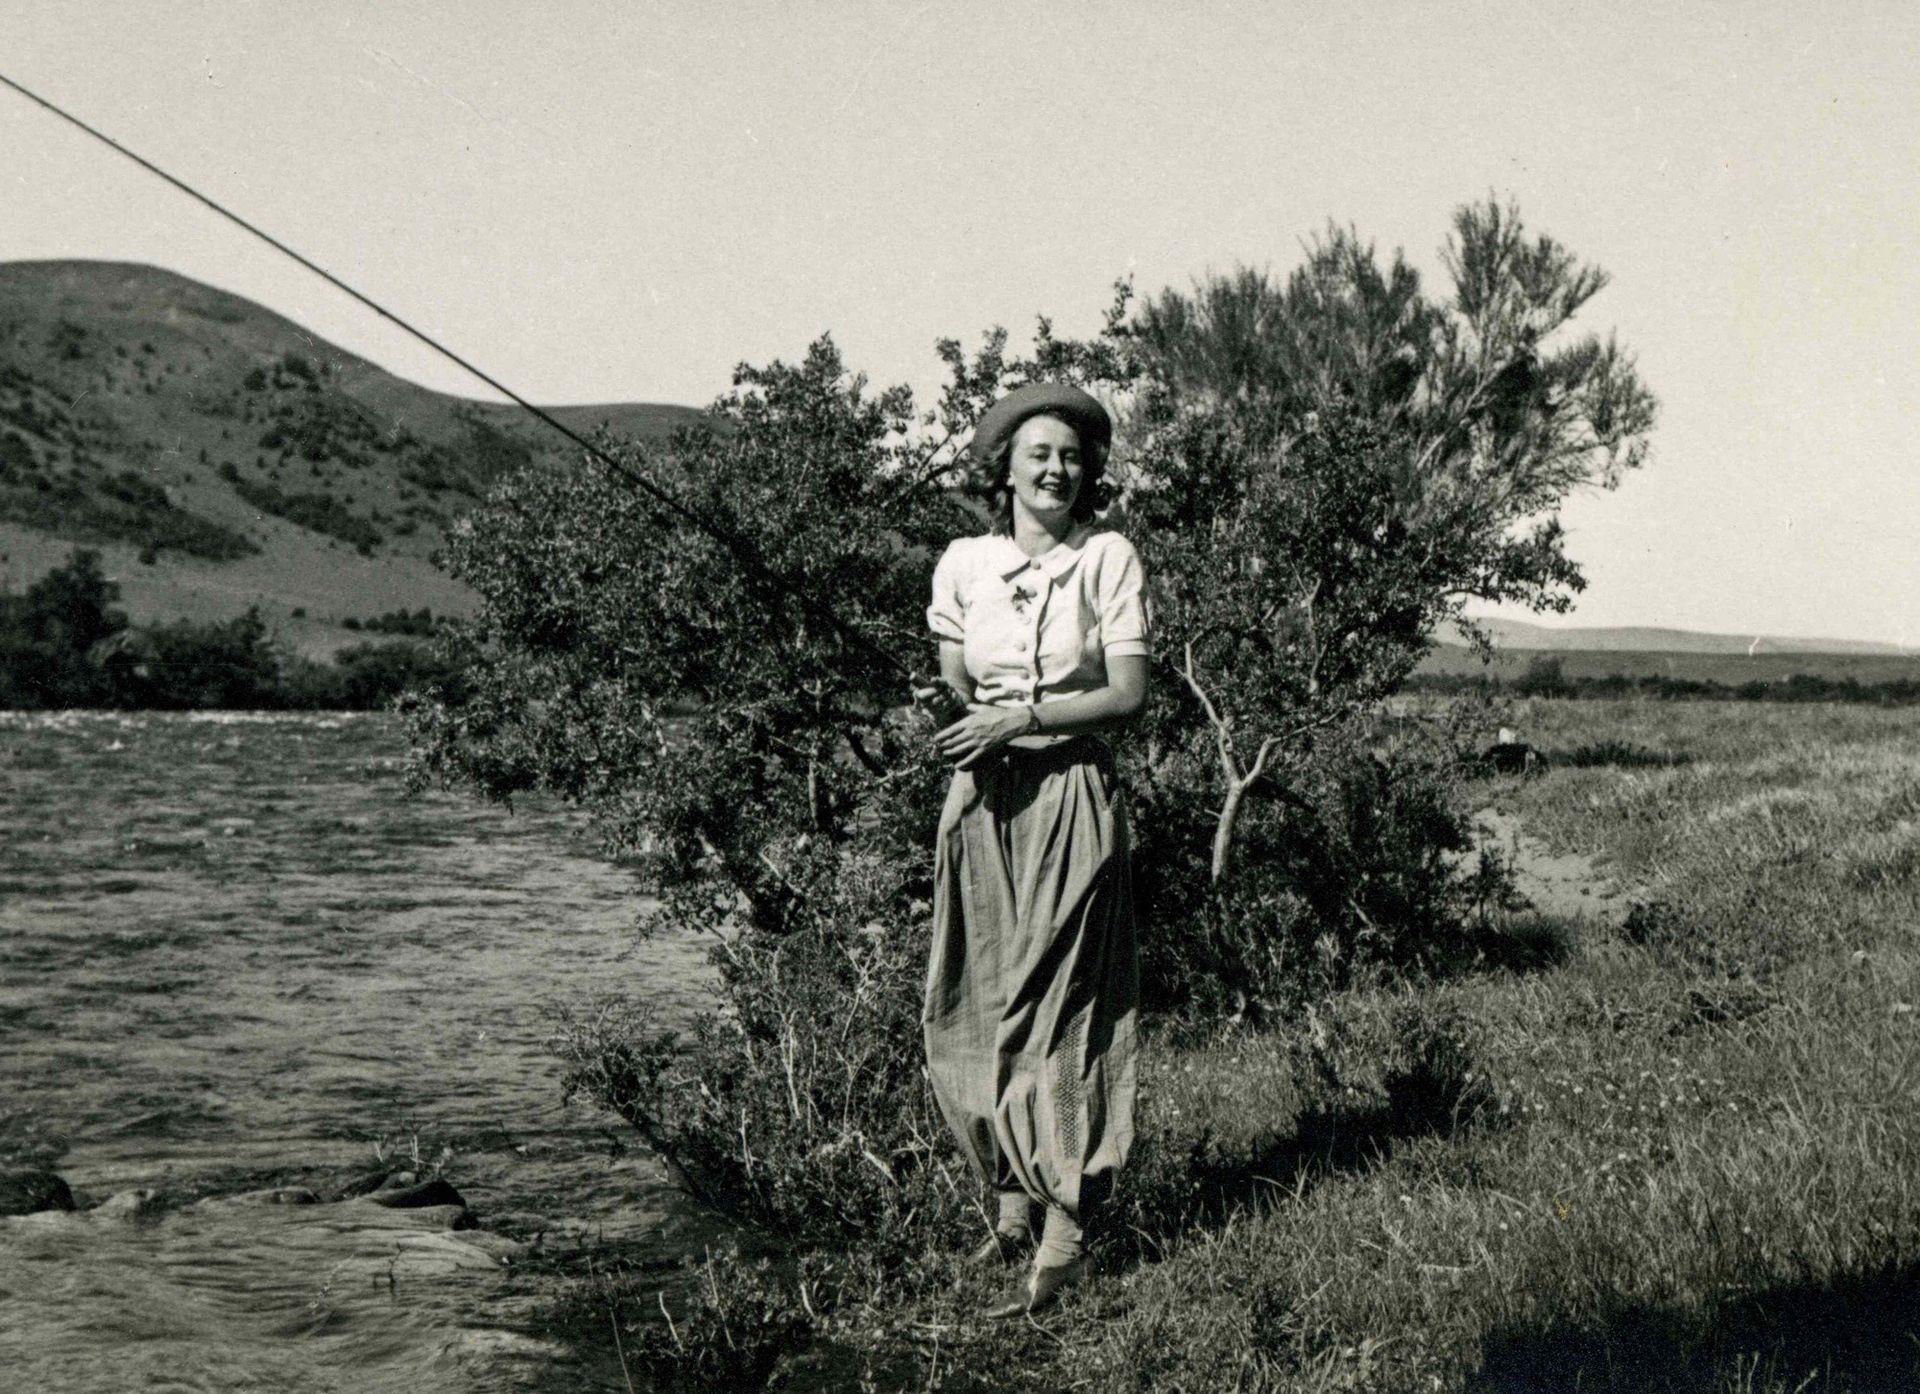 Renée Dickinson con su caña de pescar en Traful. 1946.